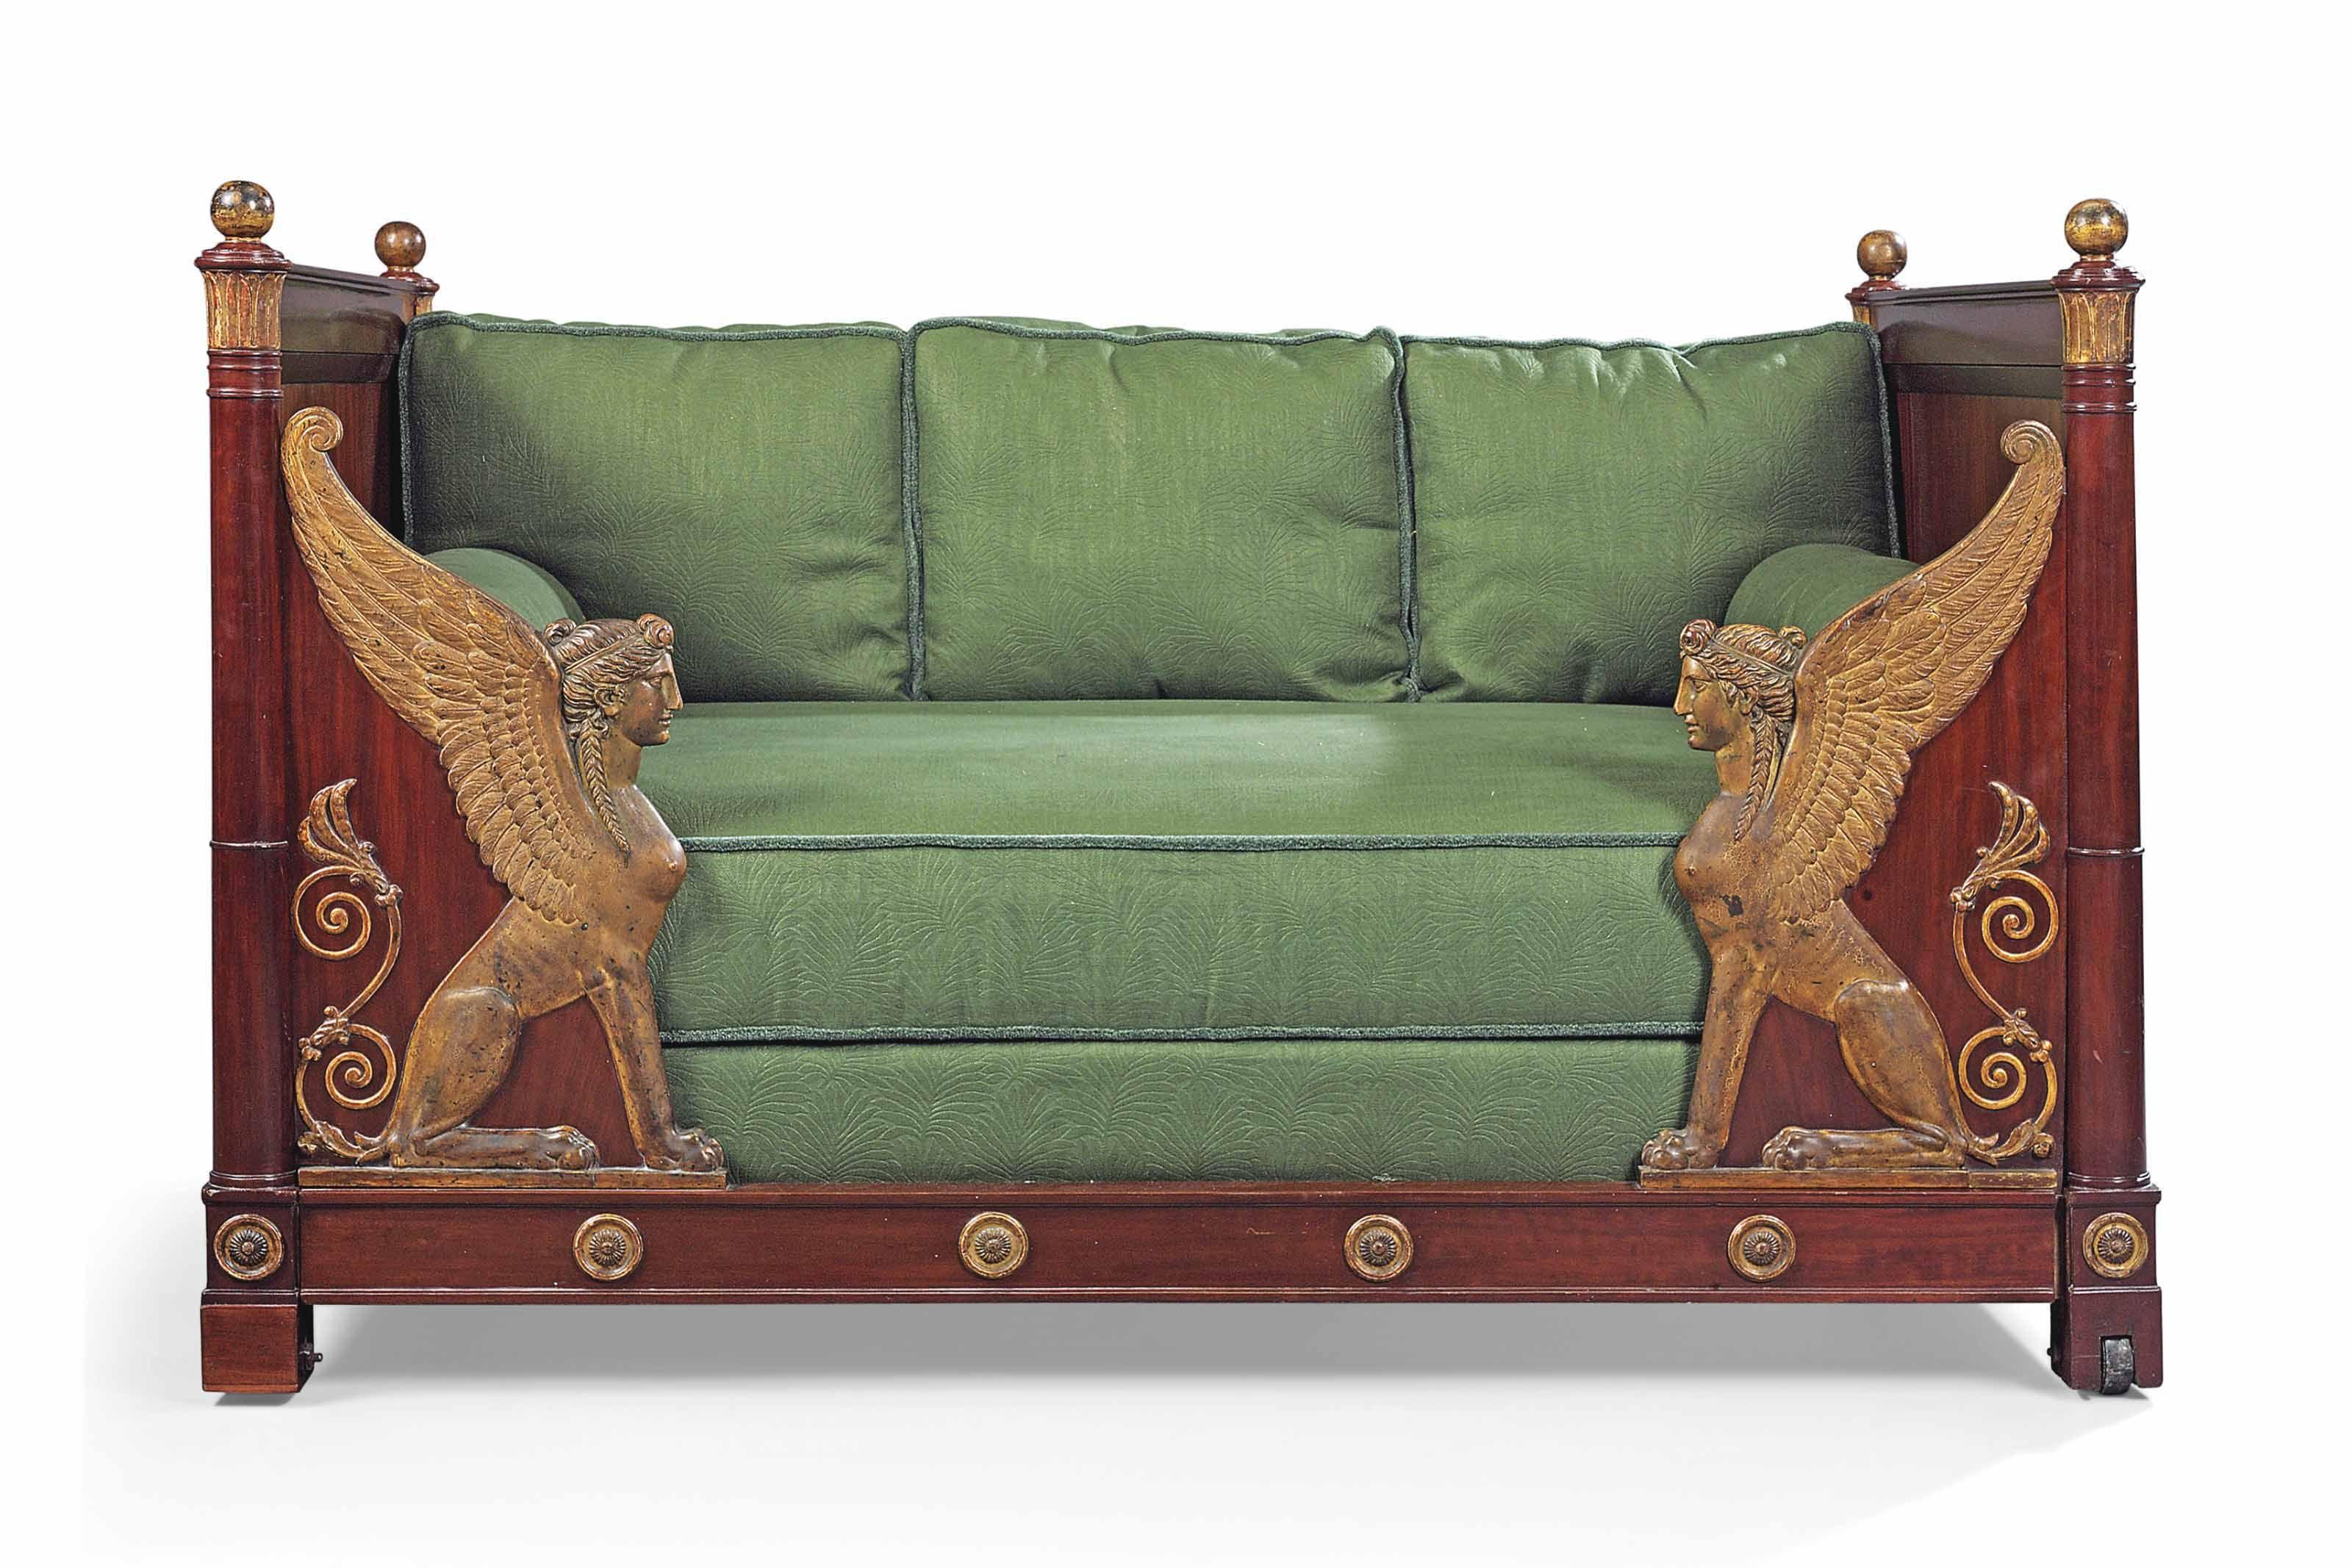 C1800 A Directoire Parcel Gilt Mahogany Lit En Bateau By Bernard Molitor Circa 1800 Price Realised Gbp 20 0 Empire Furniture Furniture Neoclassical Furniture